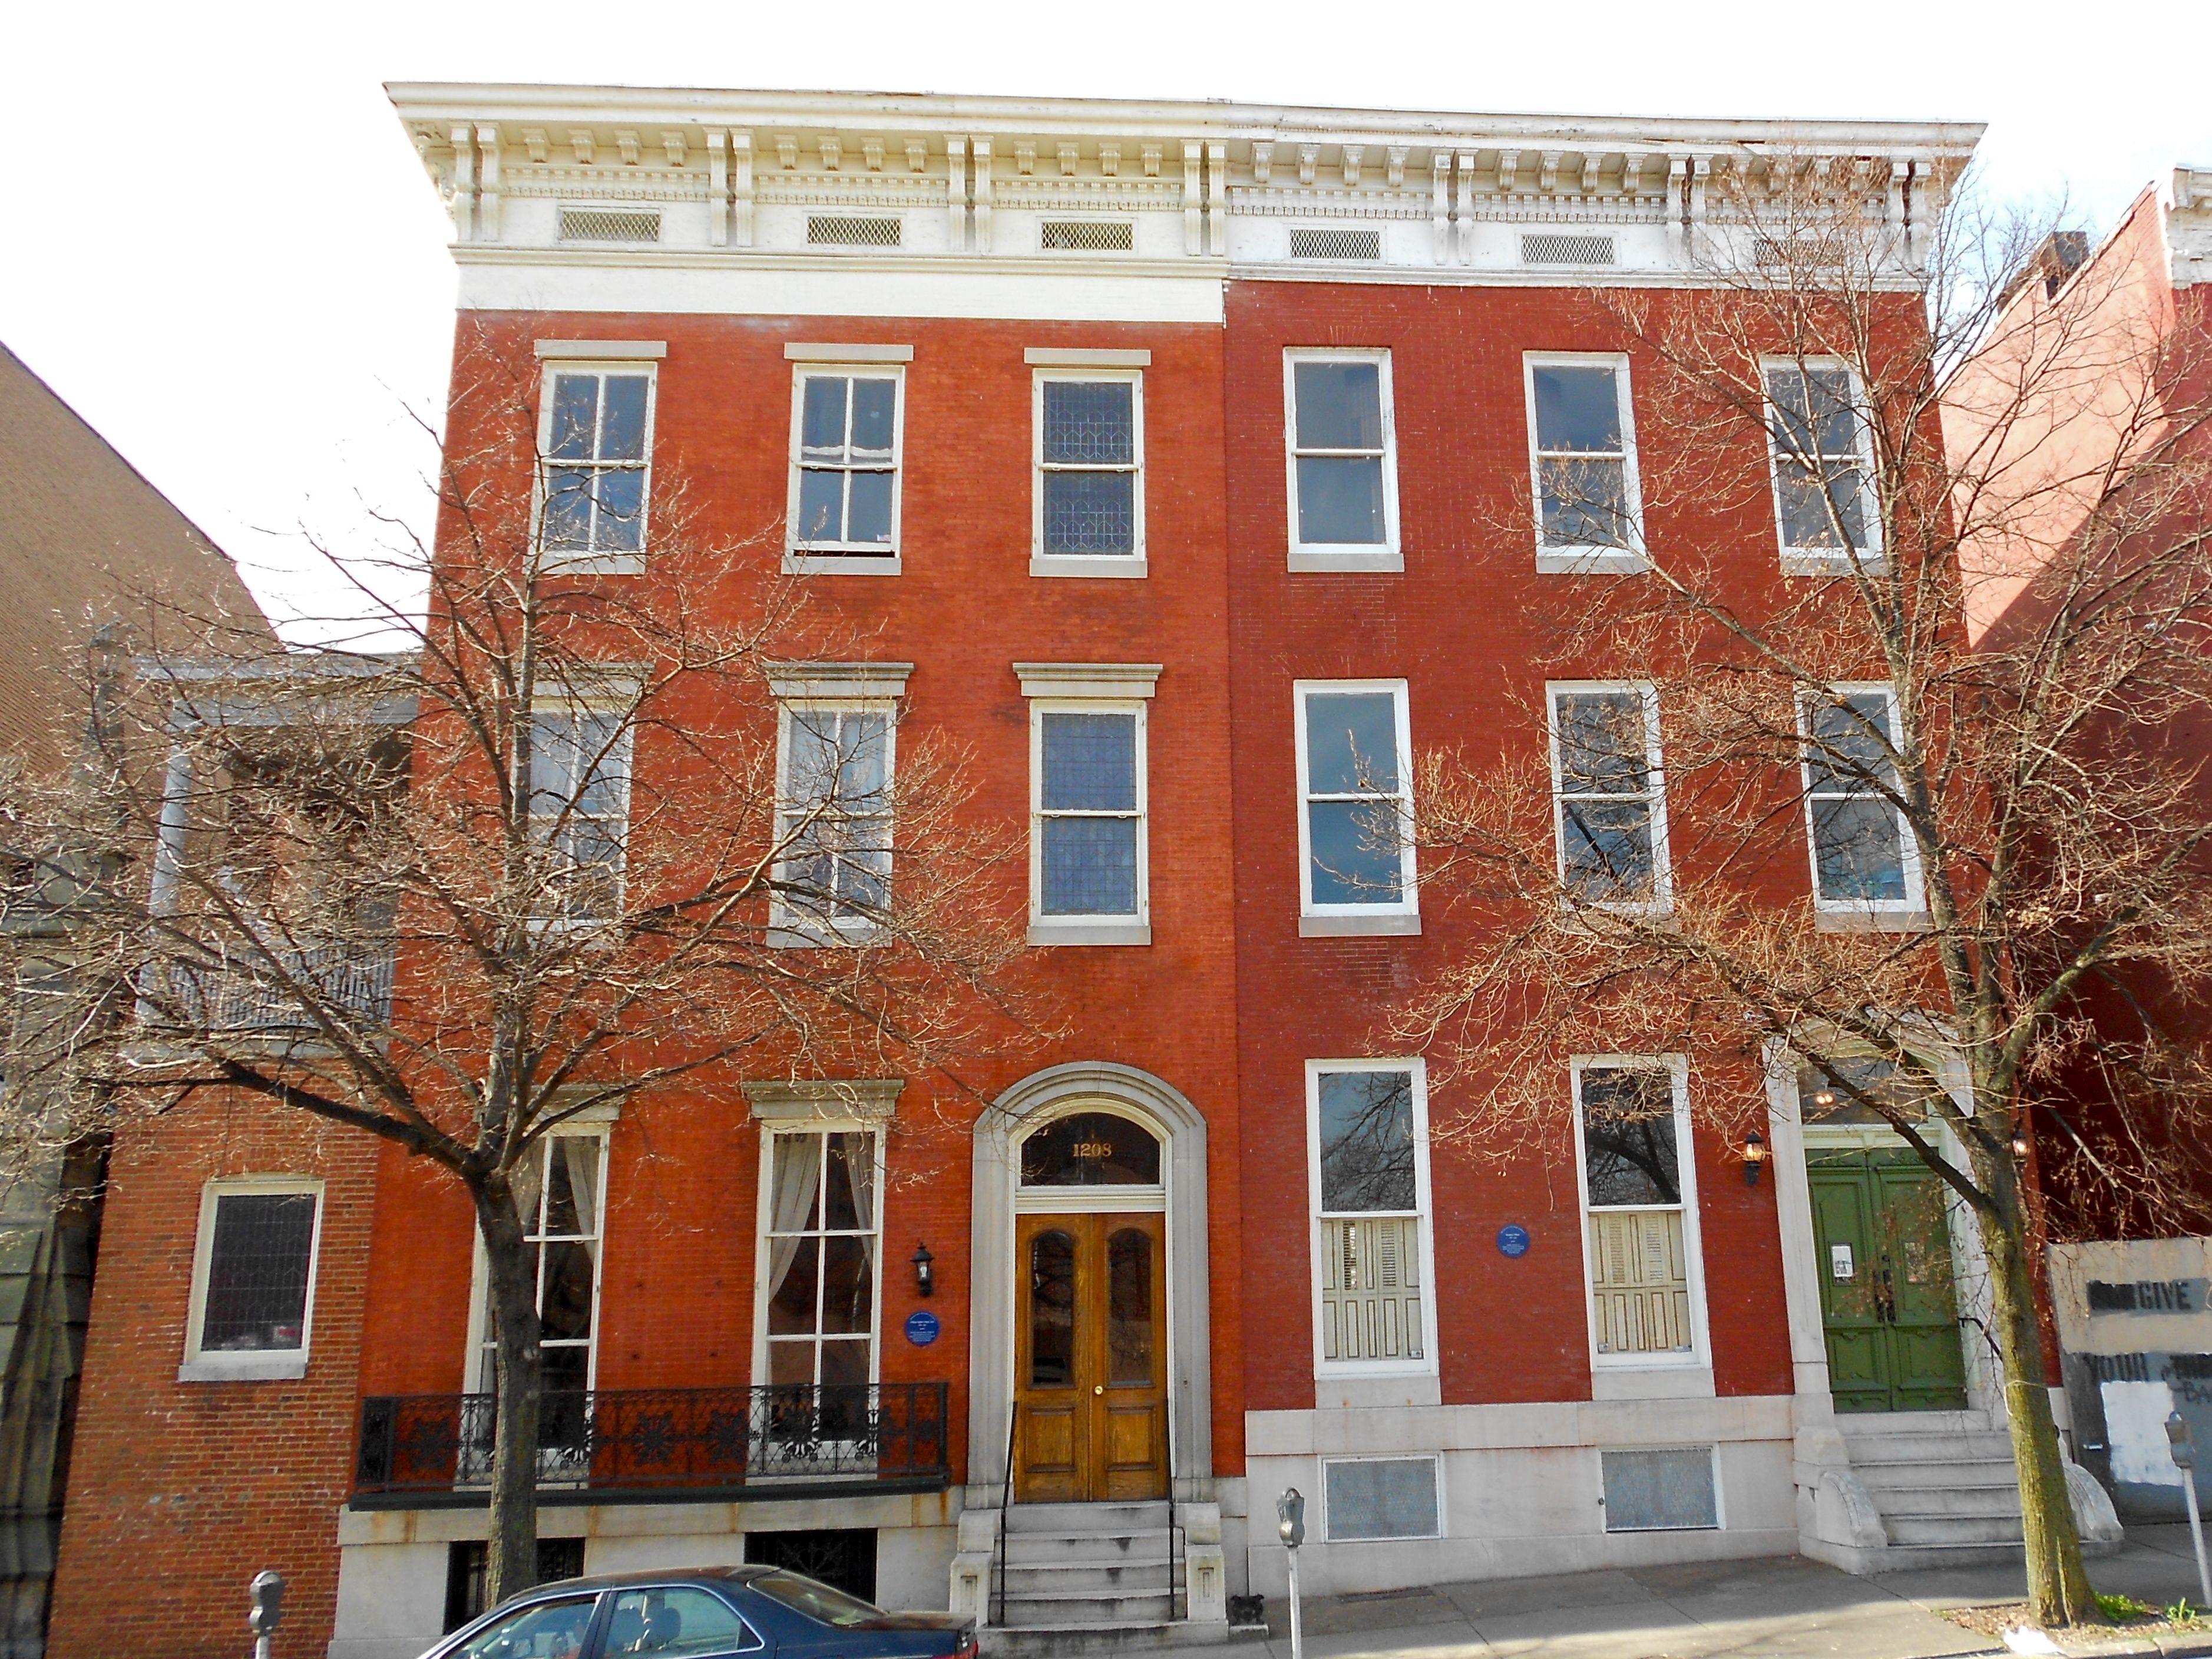 Mt Vernon Rowhouses Baltimore Baltimore Apartment City House Row House